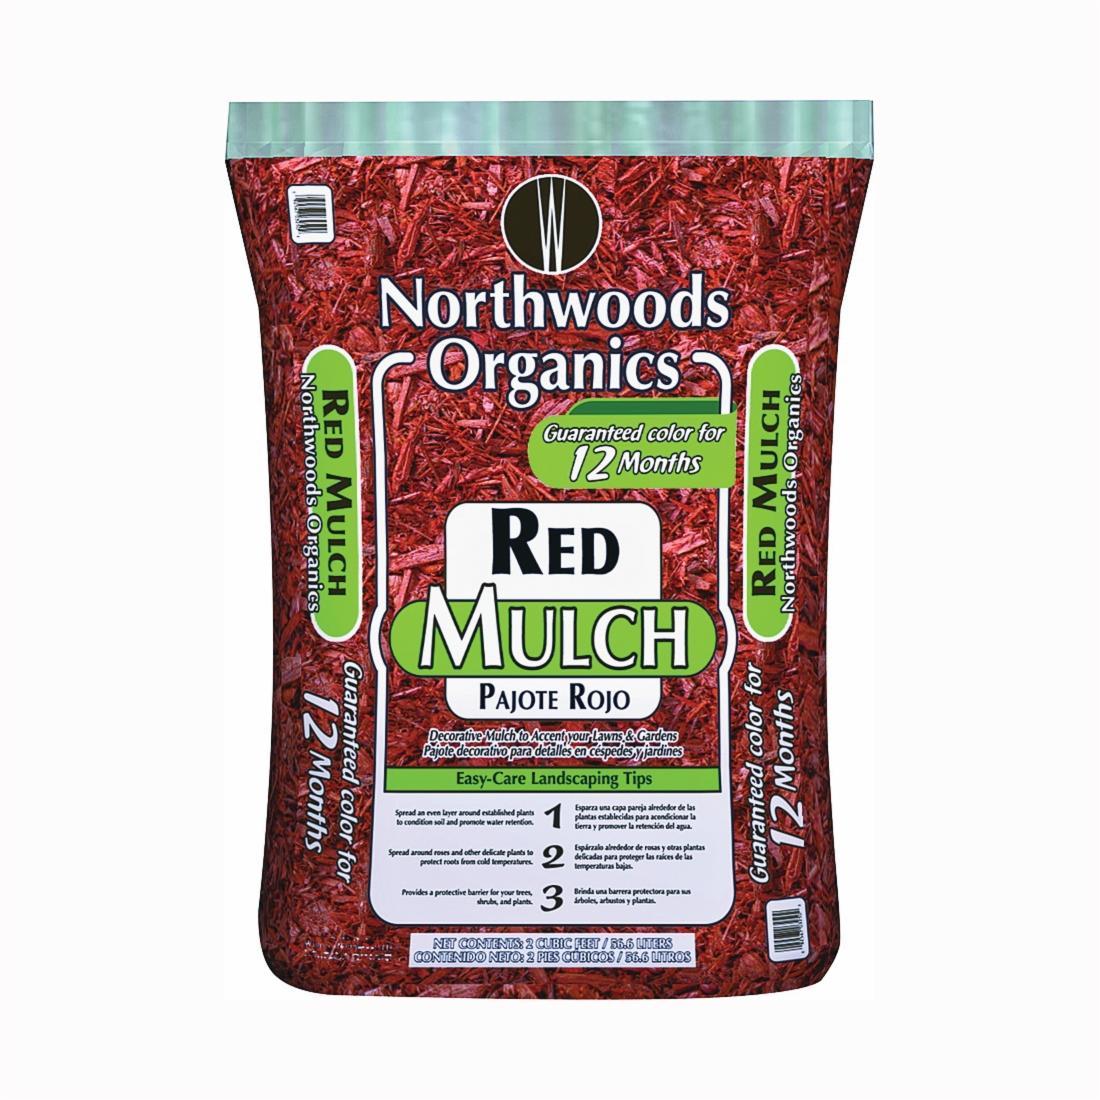 Northwoods Organics WNW03250